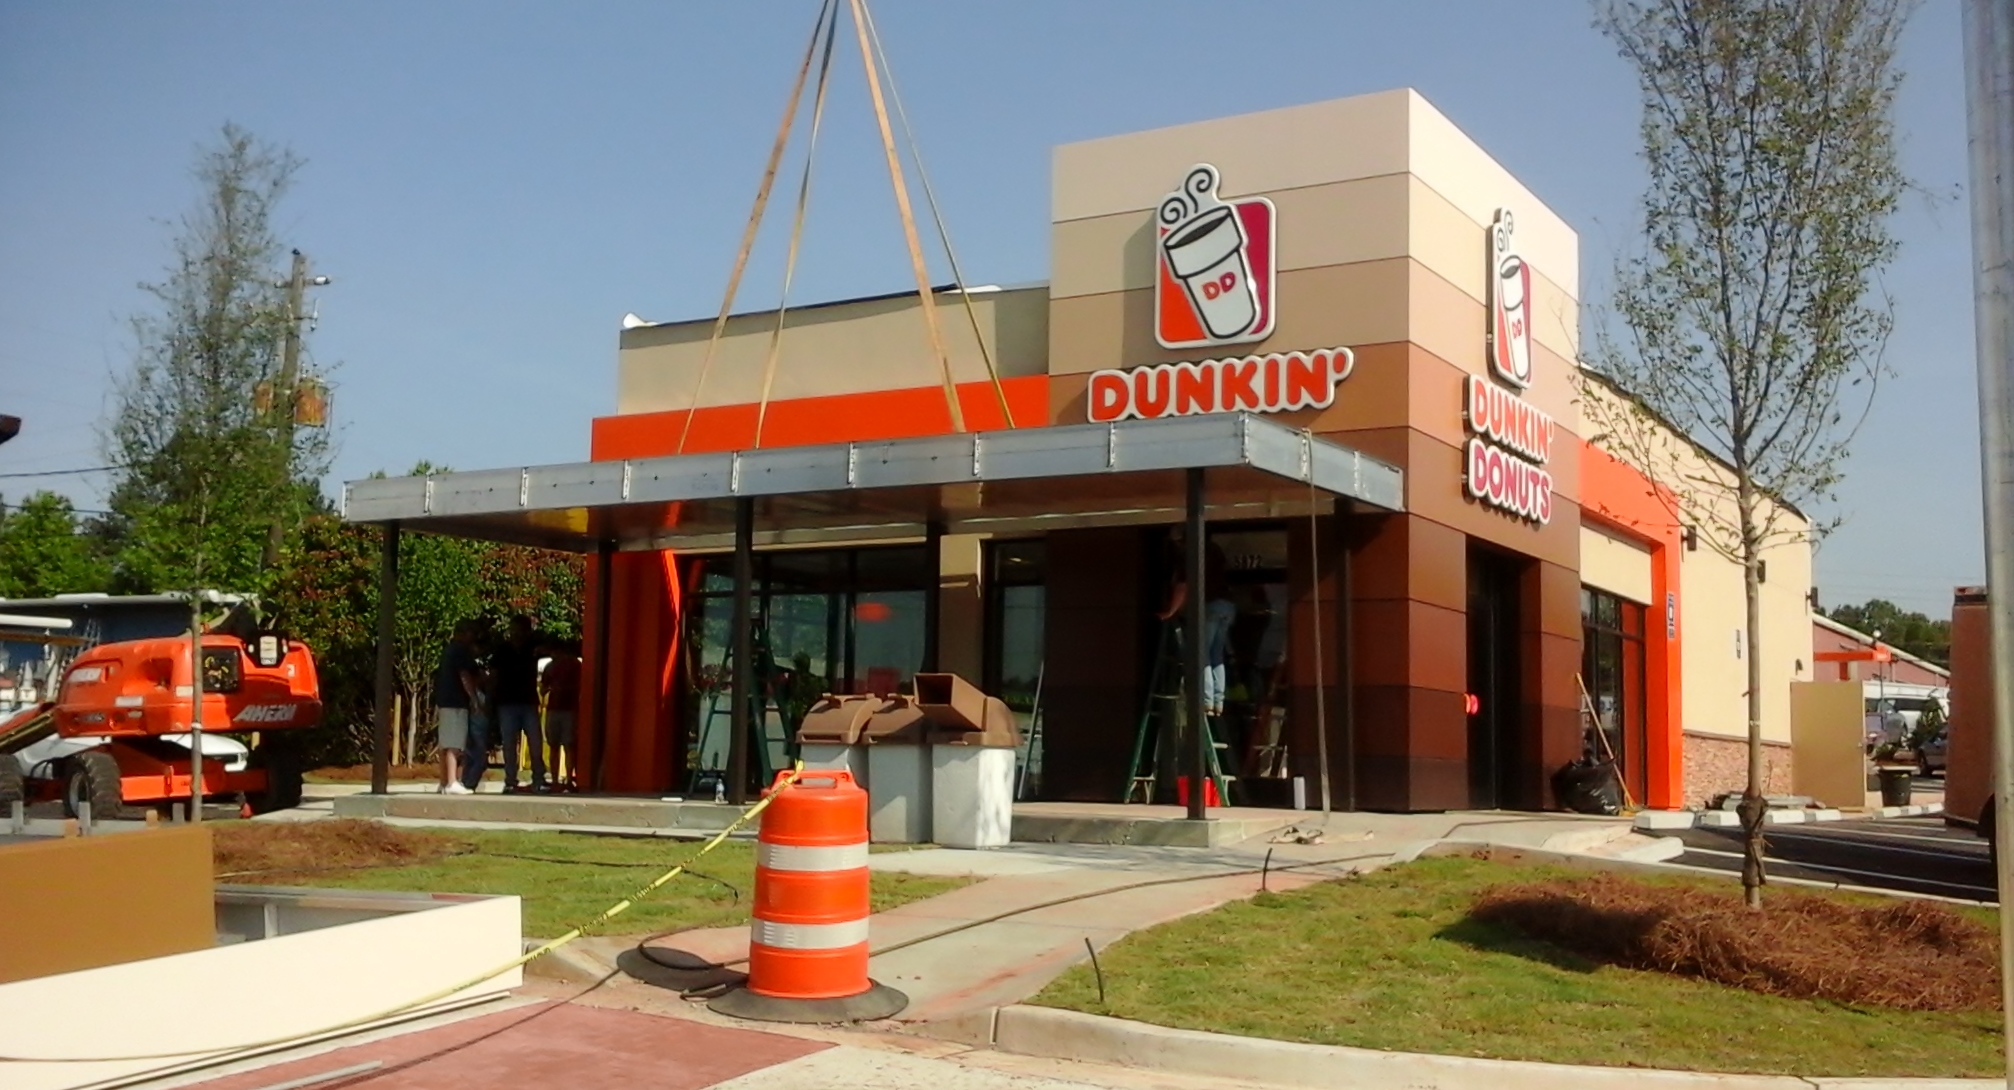 Dunkin Donuts Atlanta Ga Doraville Ccs Image Group